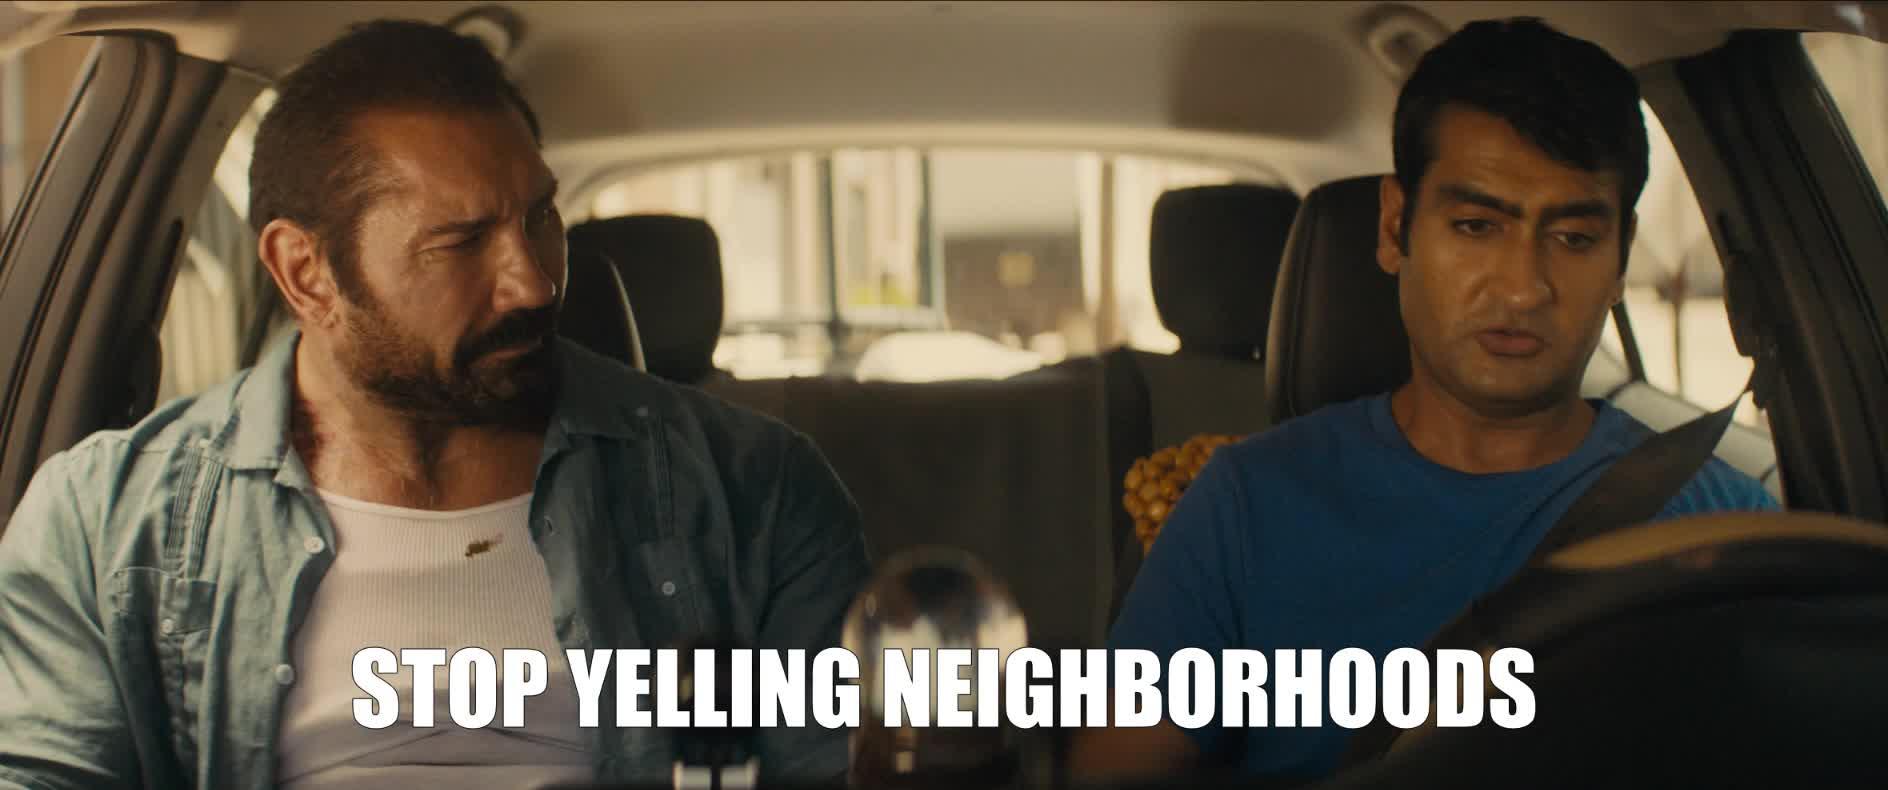 dave bautista, funny, kumail nanjiani, stuber, stuber movie, uber, Stop Yelling Neighborhoods Kumail Nanjiani GIFs